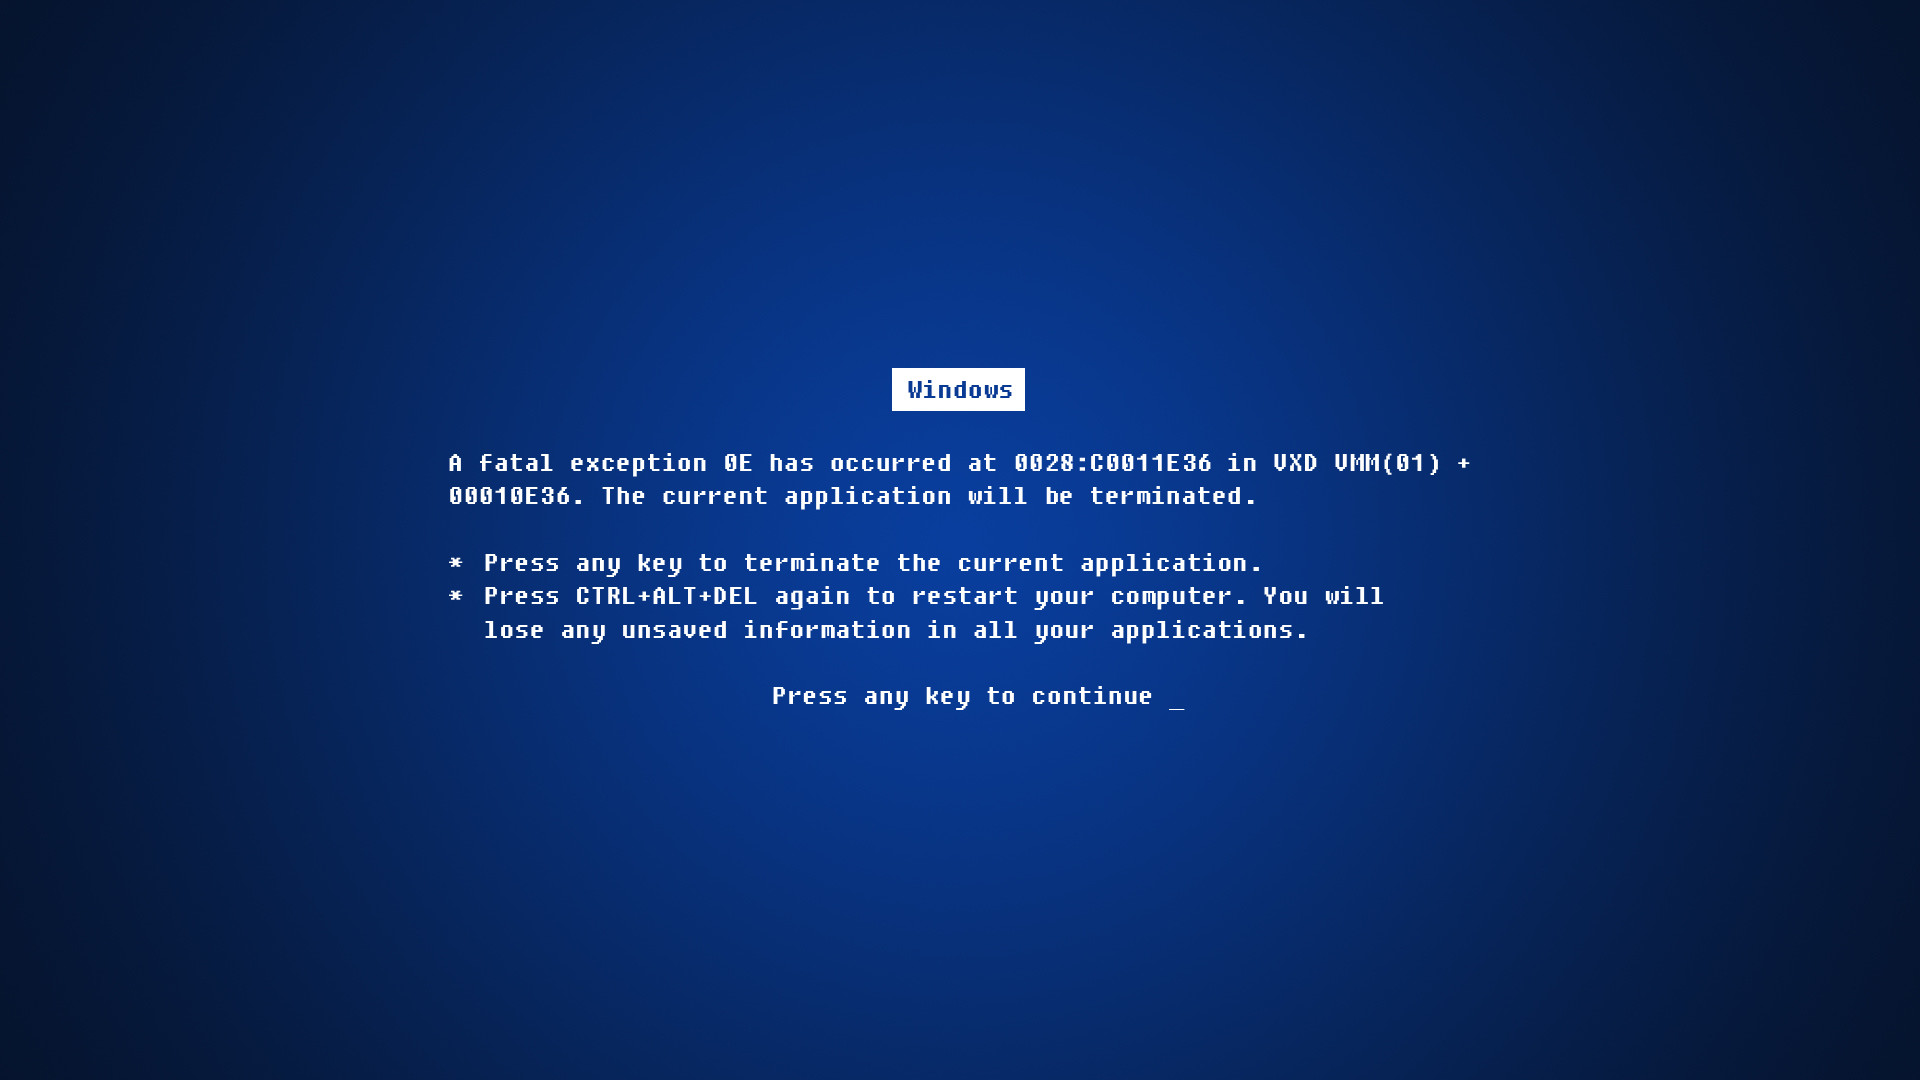 Blue screen of death desktop PC and Mac wallpaper